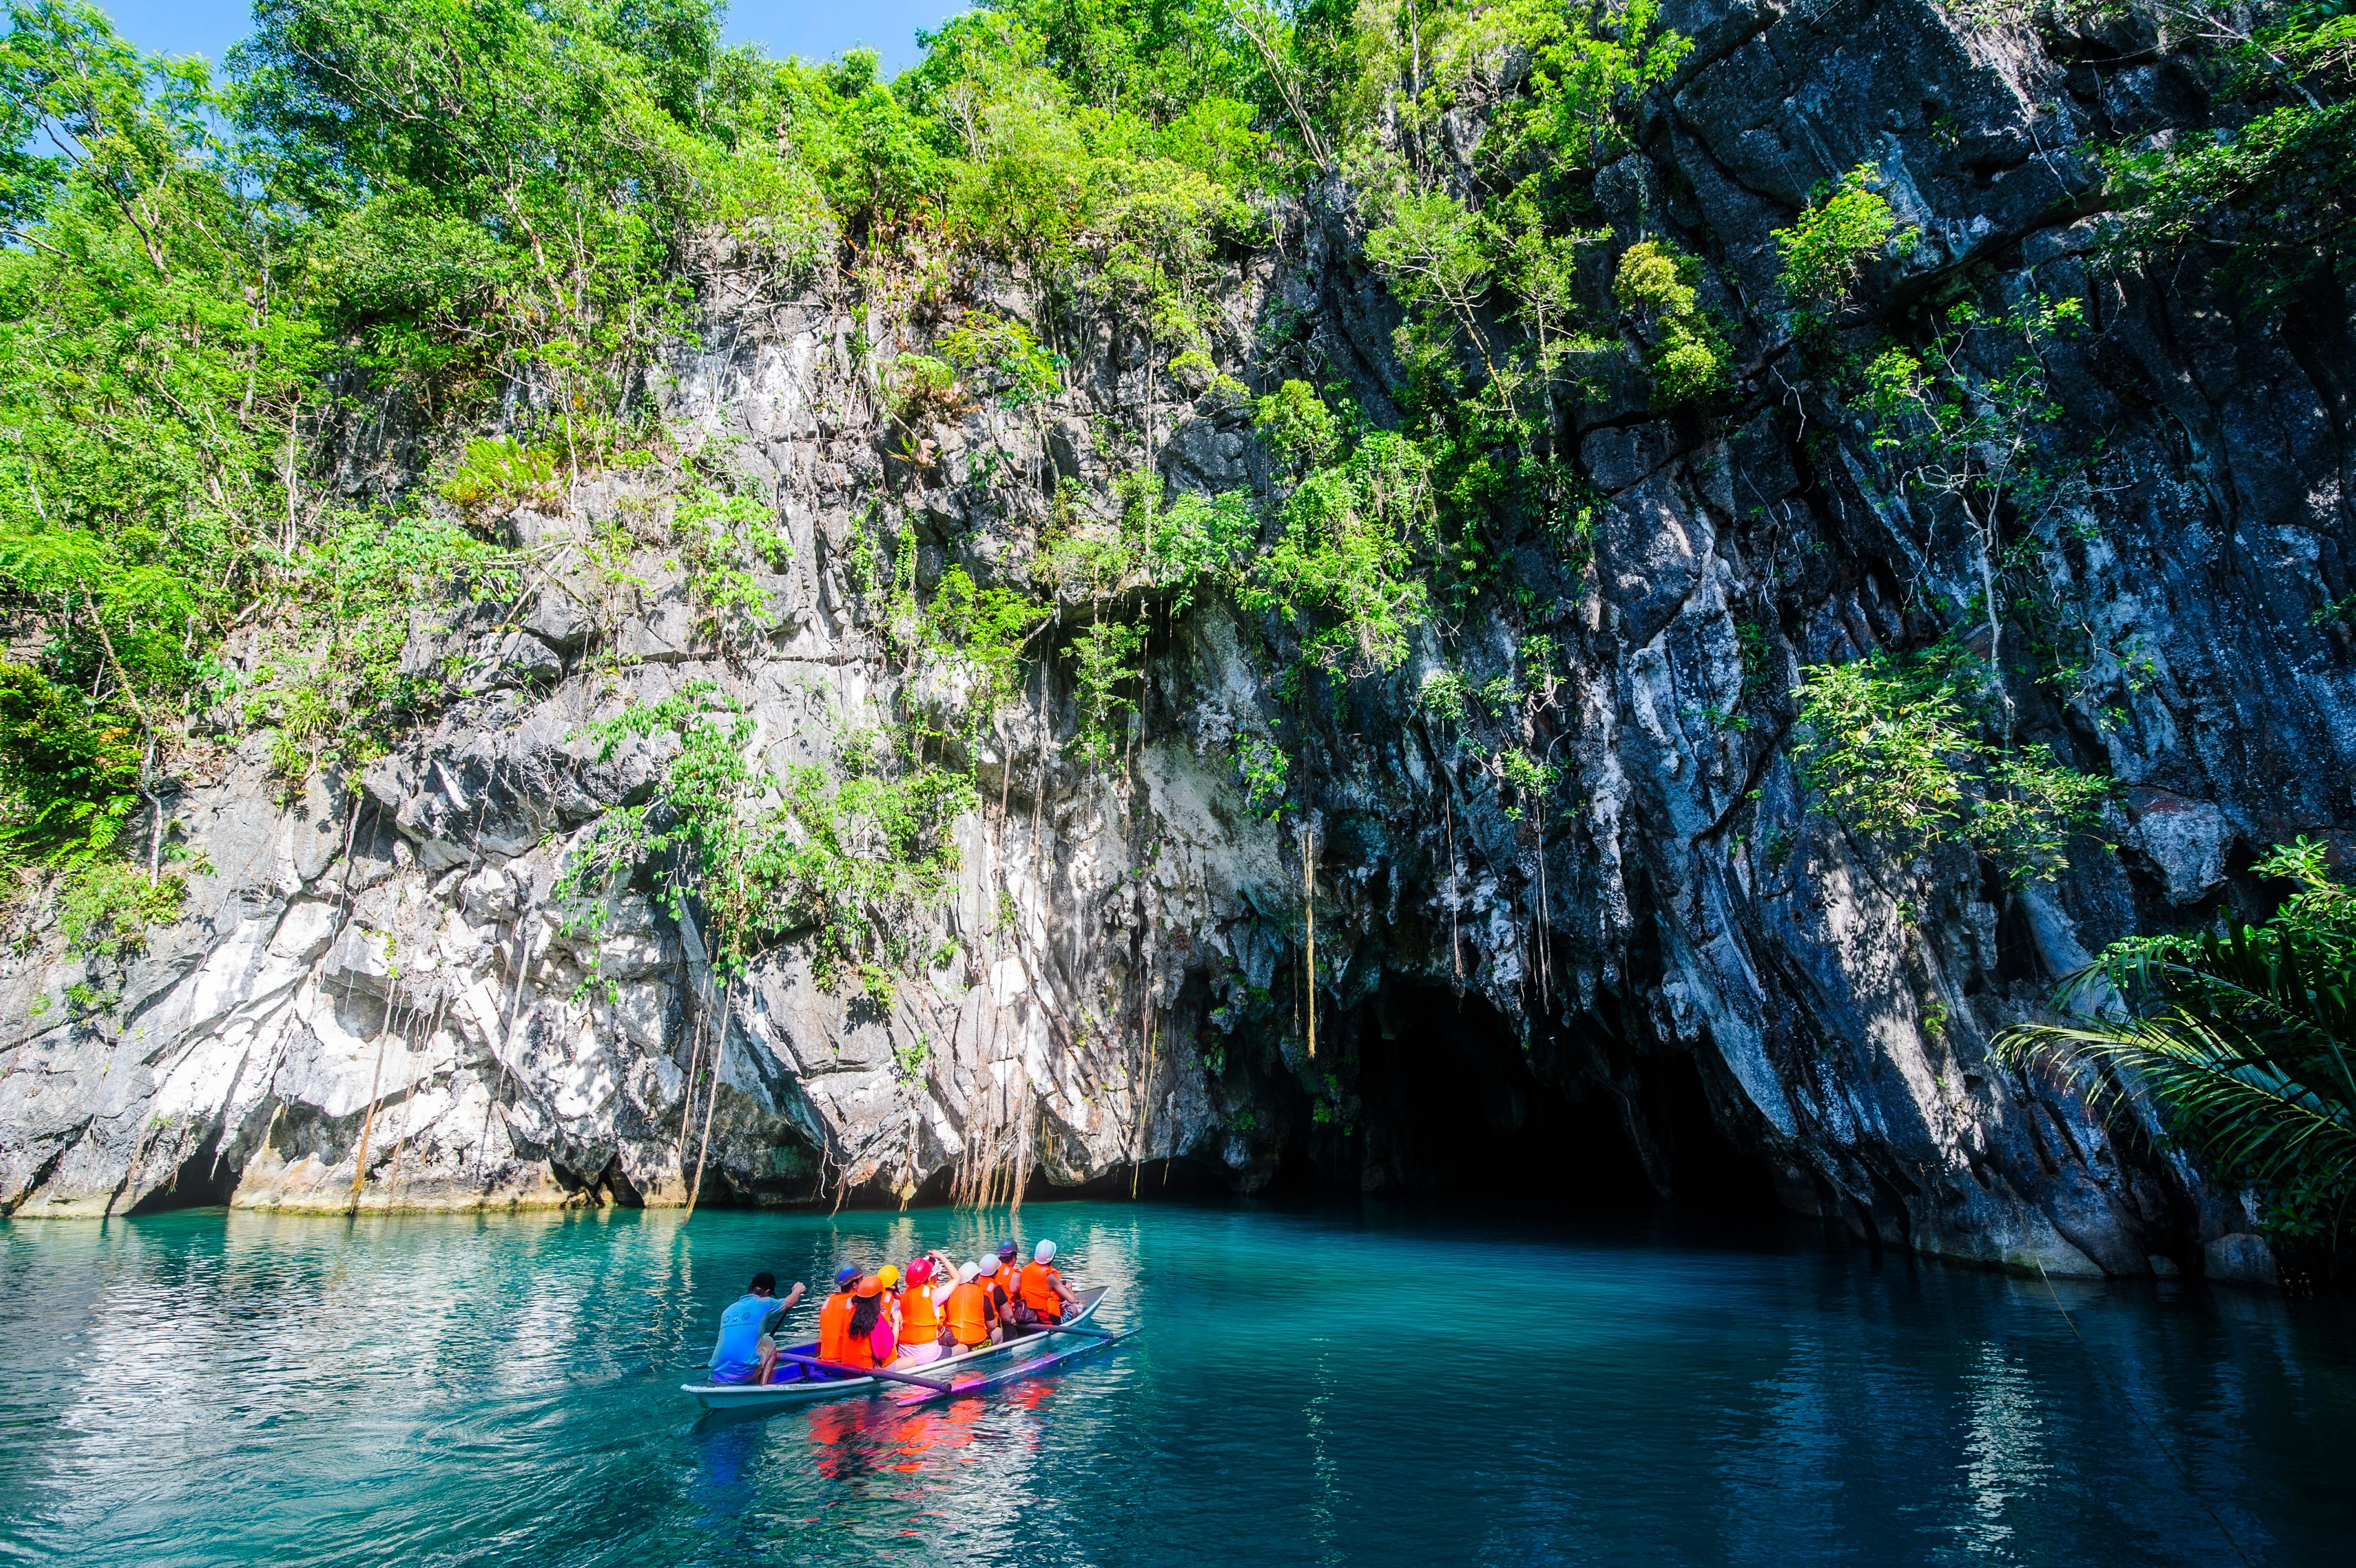 Underground river of Puerto Princesa